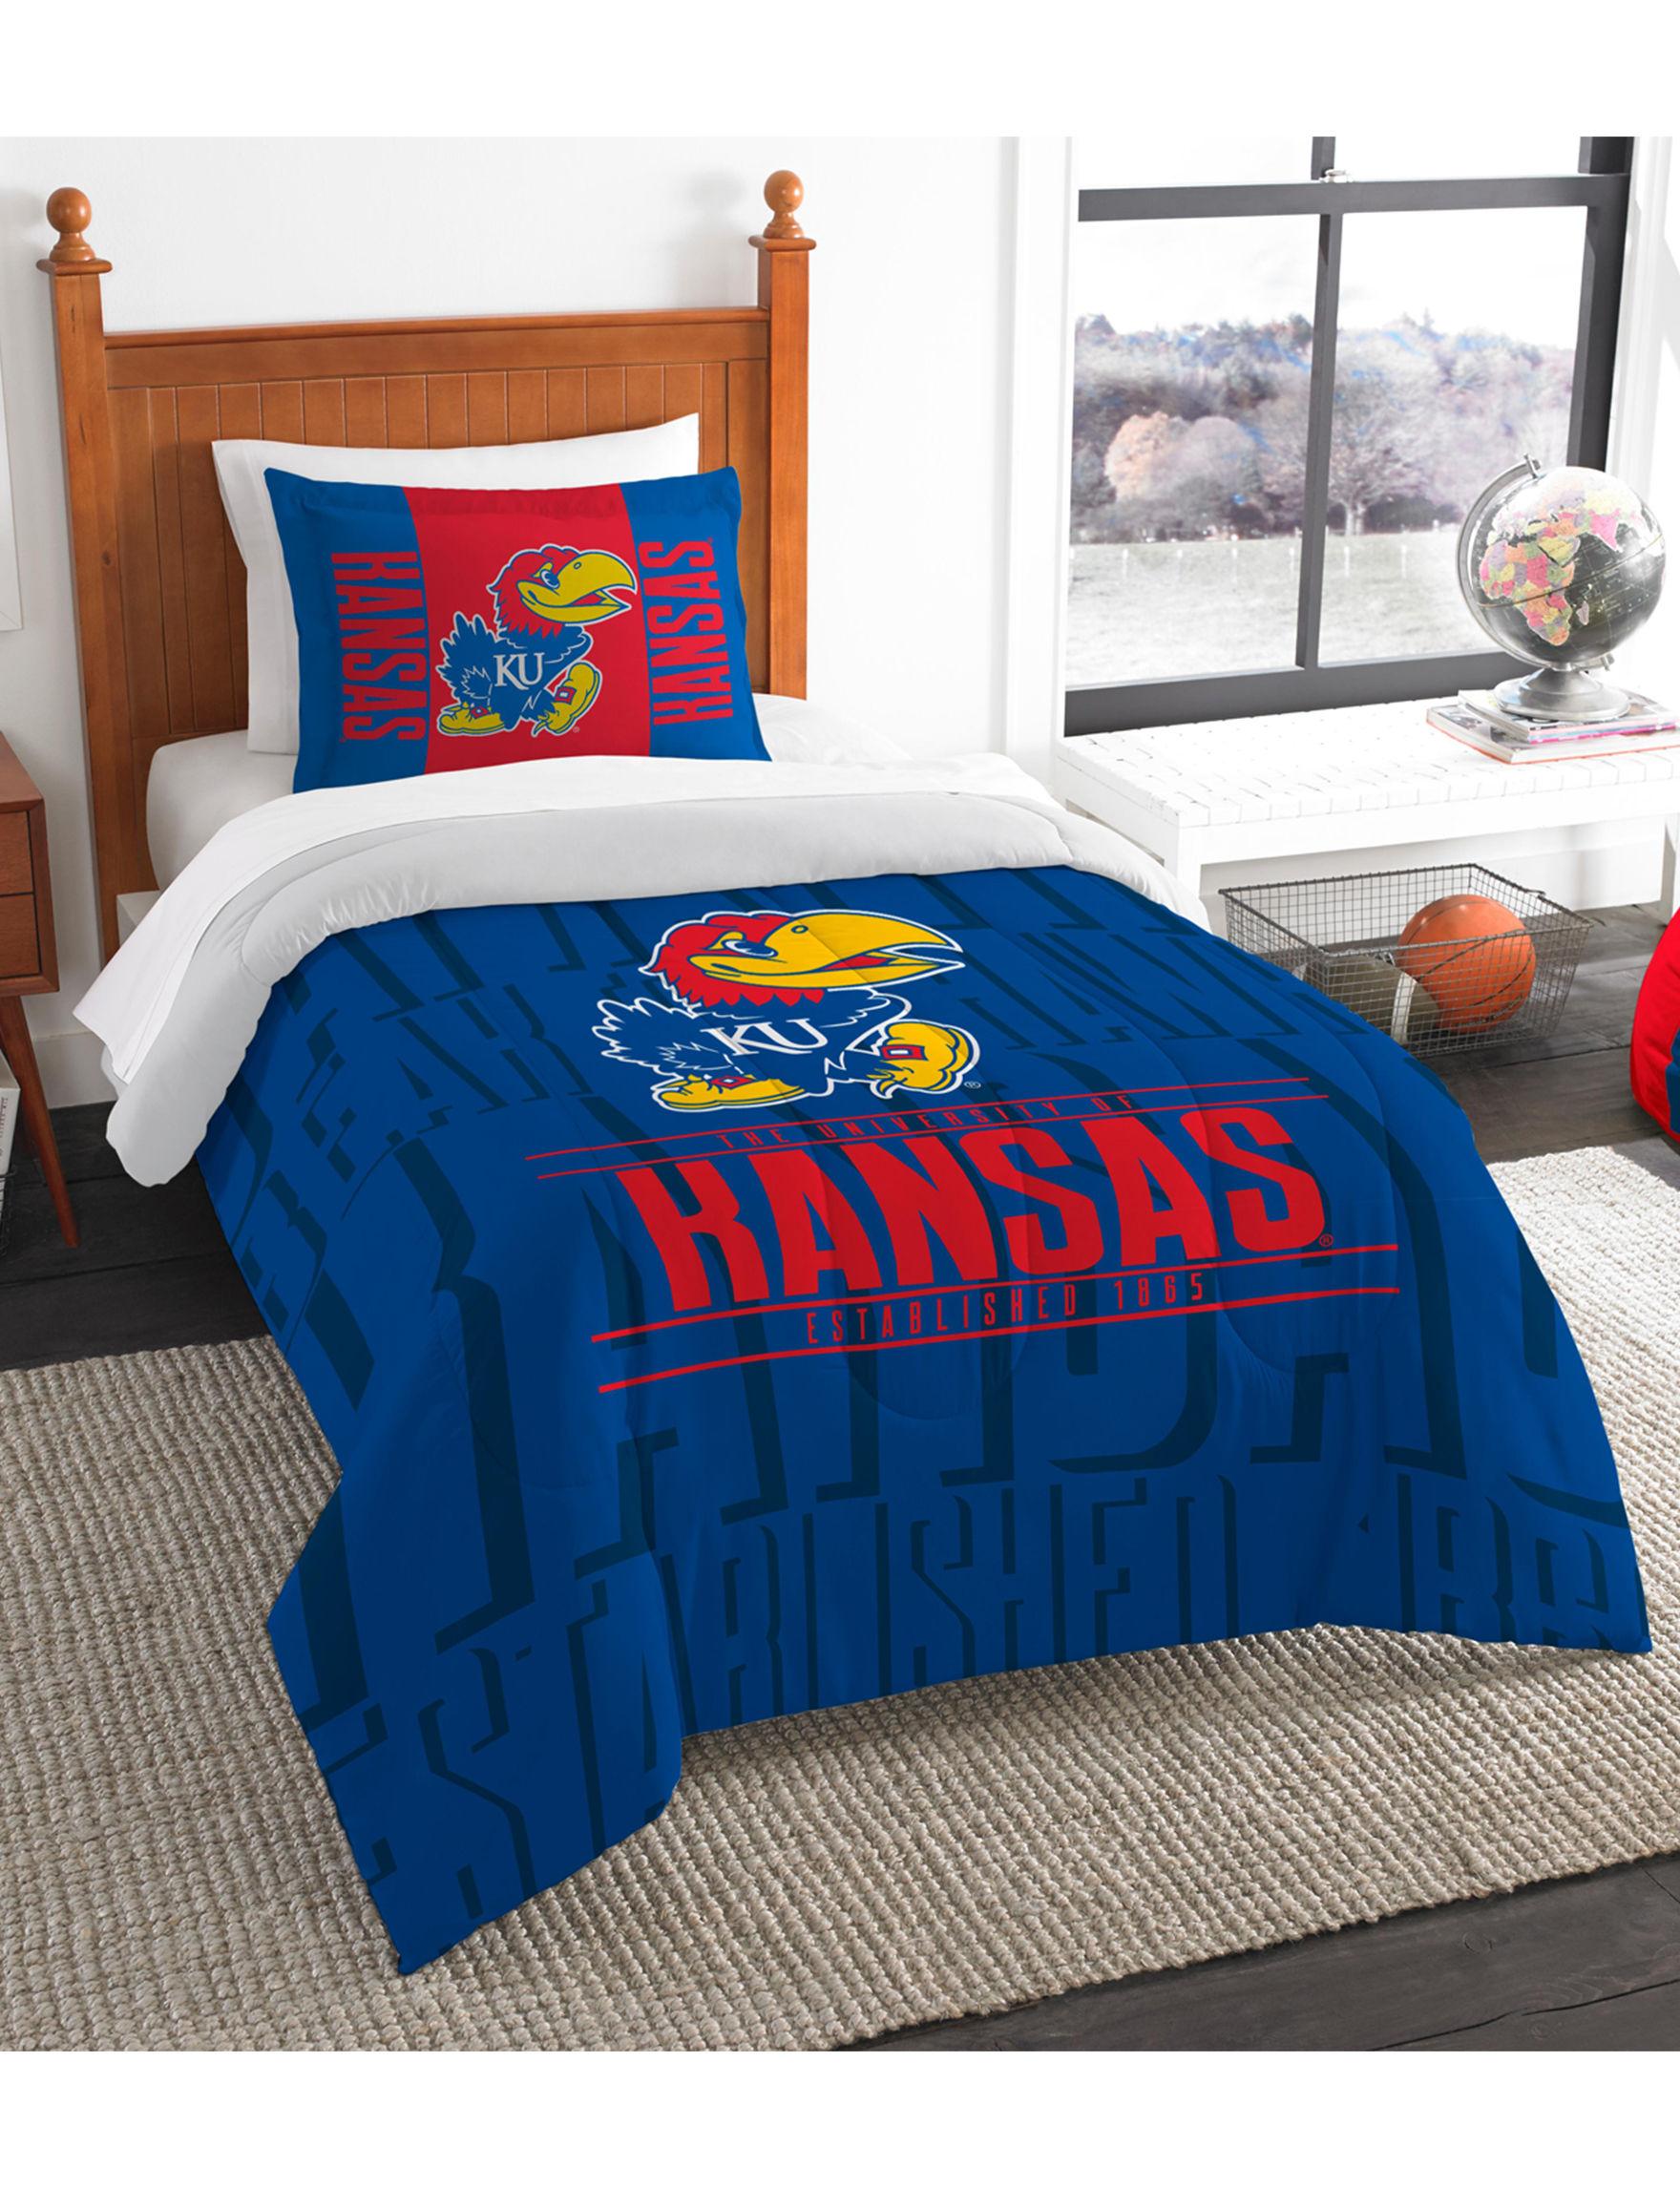 The Northwest Company  Comforters & Comforter Sets